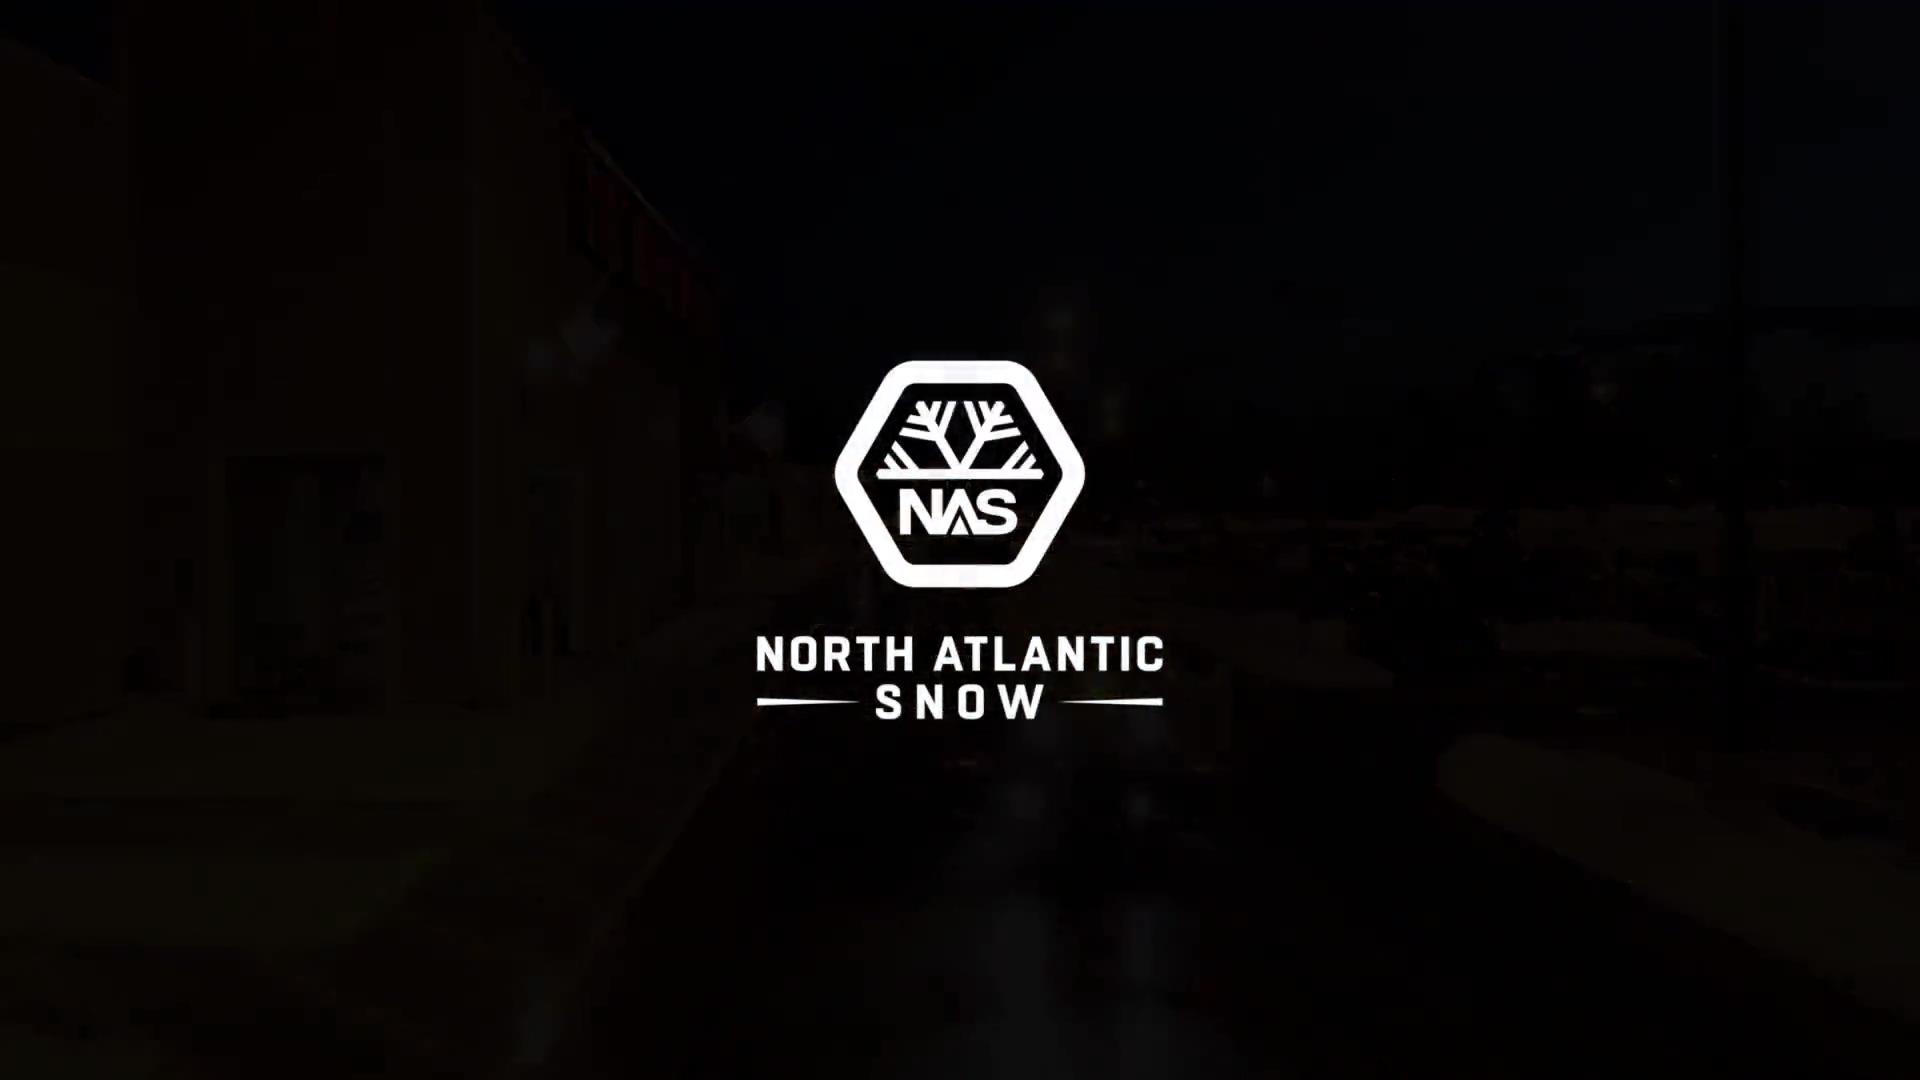 2019 NAS Promo Video